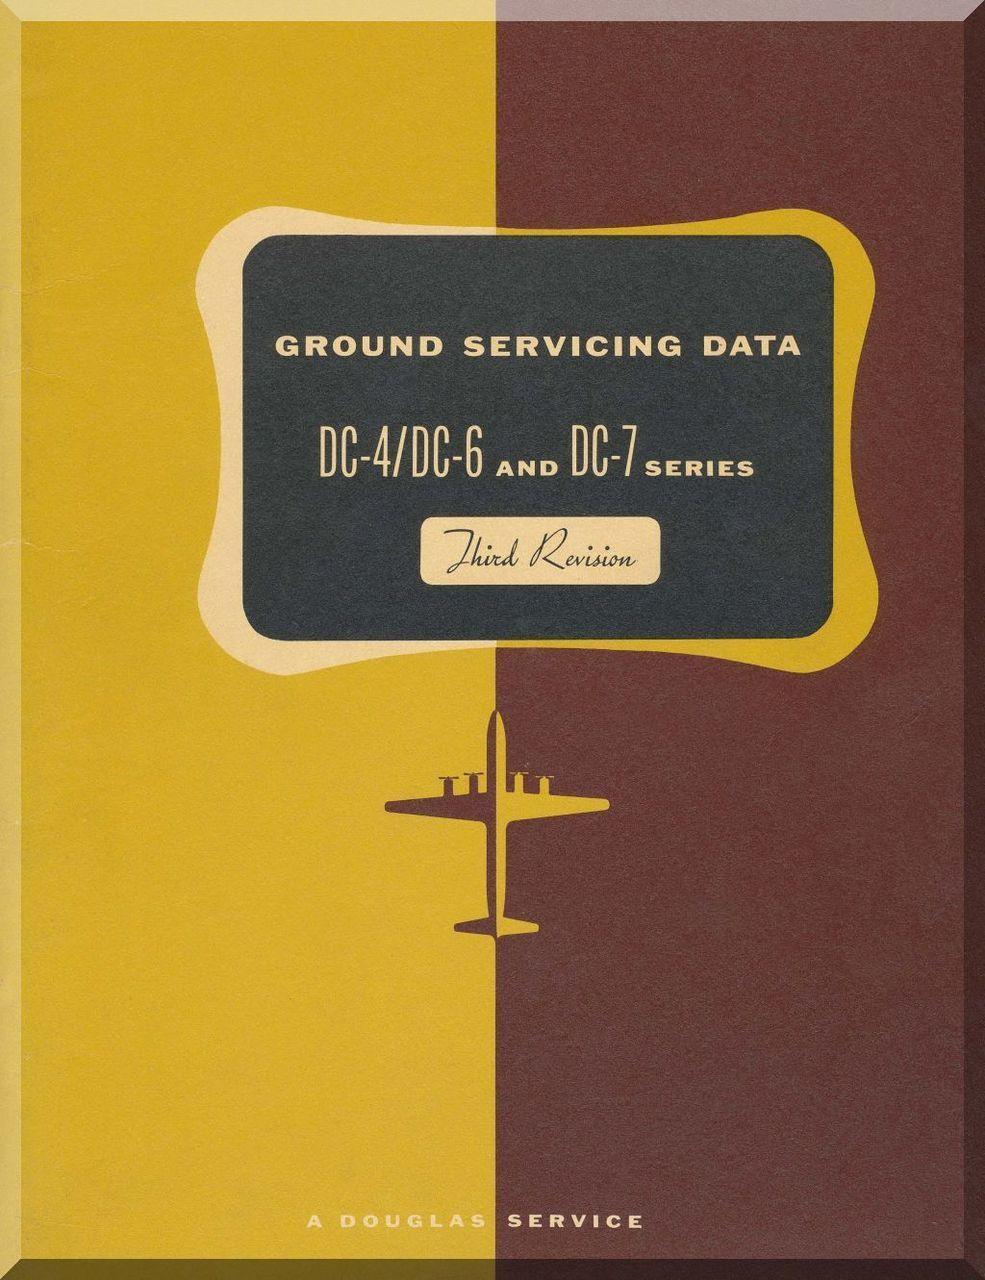 douglas dc 4 dc 6 dc 7 aircraft ground servicing data manual rh pinterest ca Manual Icon Manual Labor